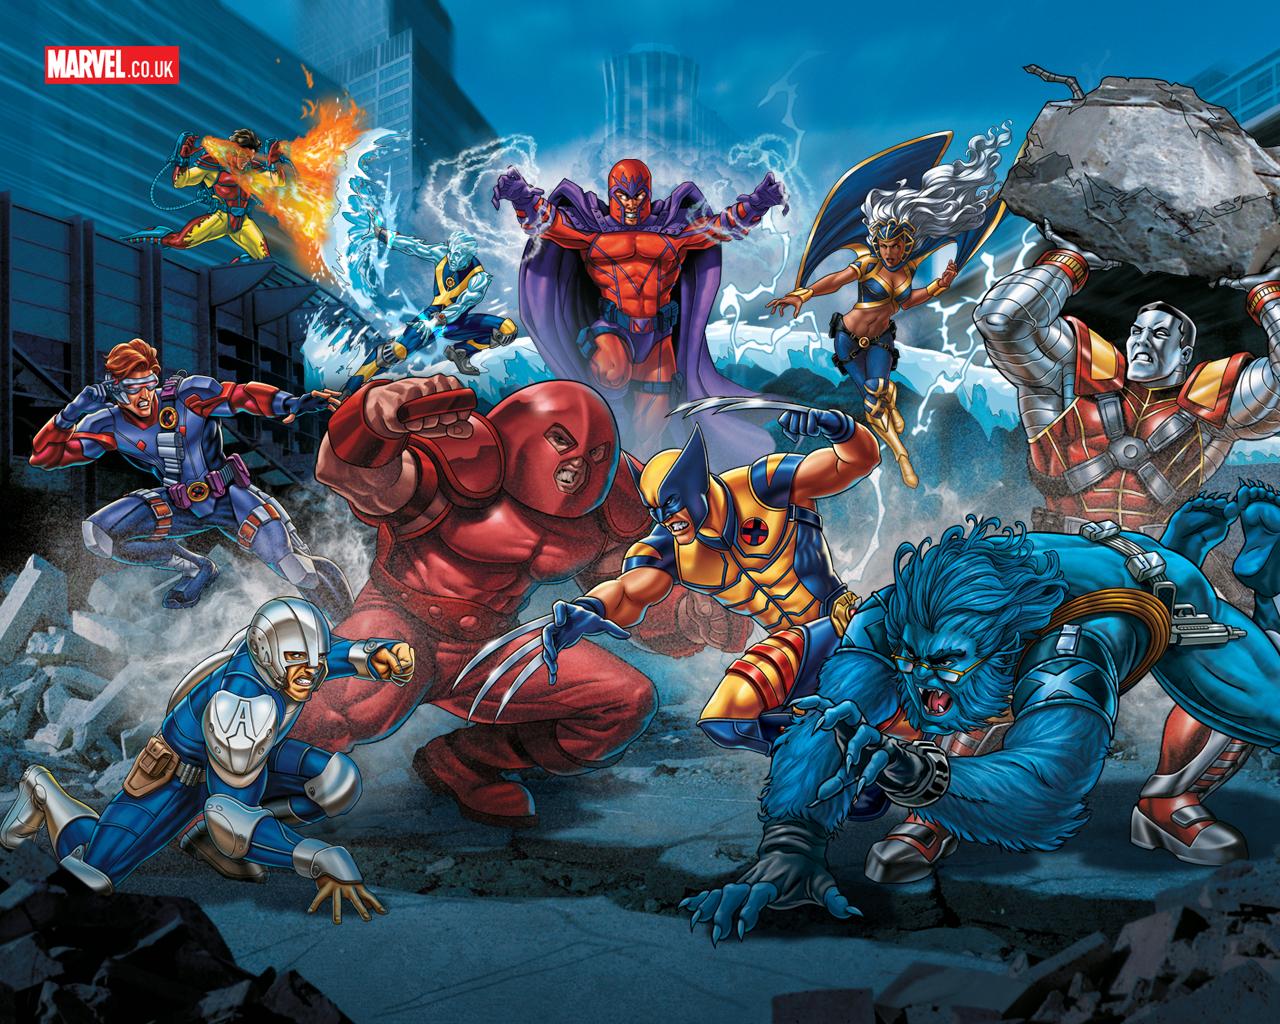 [48+] Marvel and DC Comics Wallpapers on WallpaperSafari